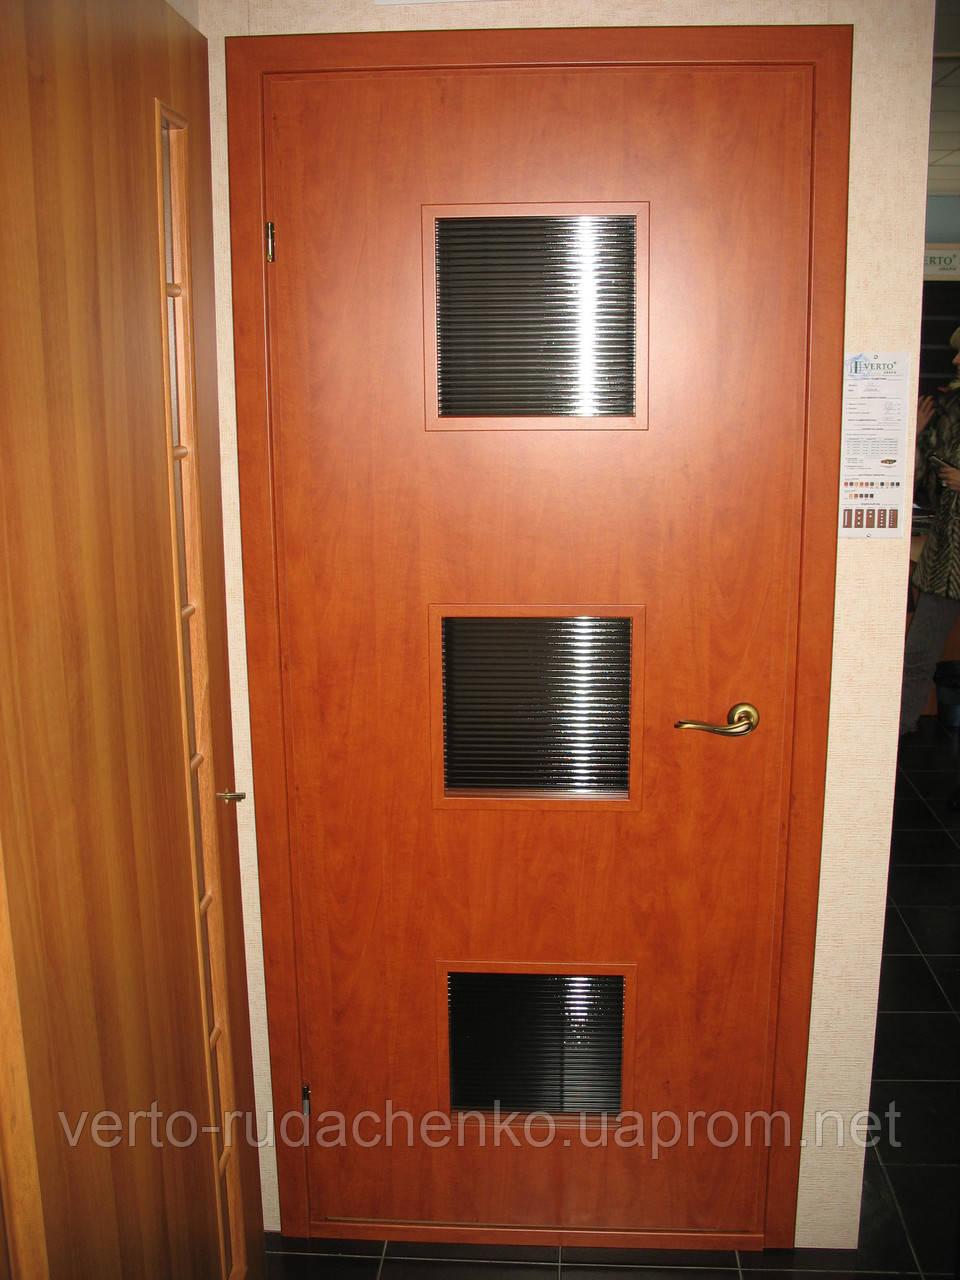 Двери Verto Геометрия 3.3 цвет Орех темный «Verto-CELL»